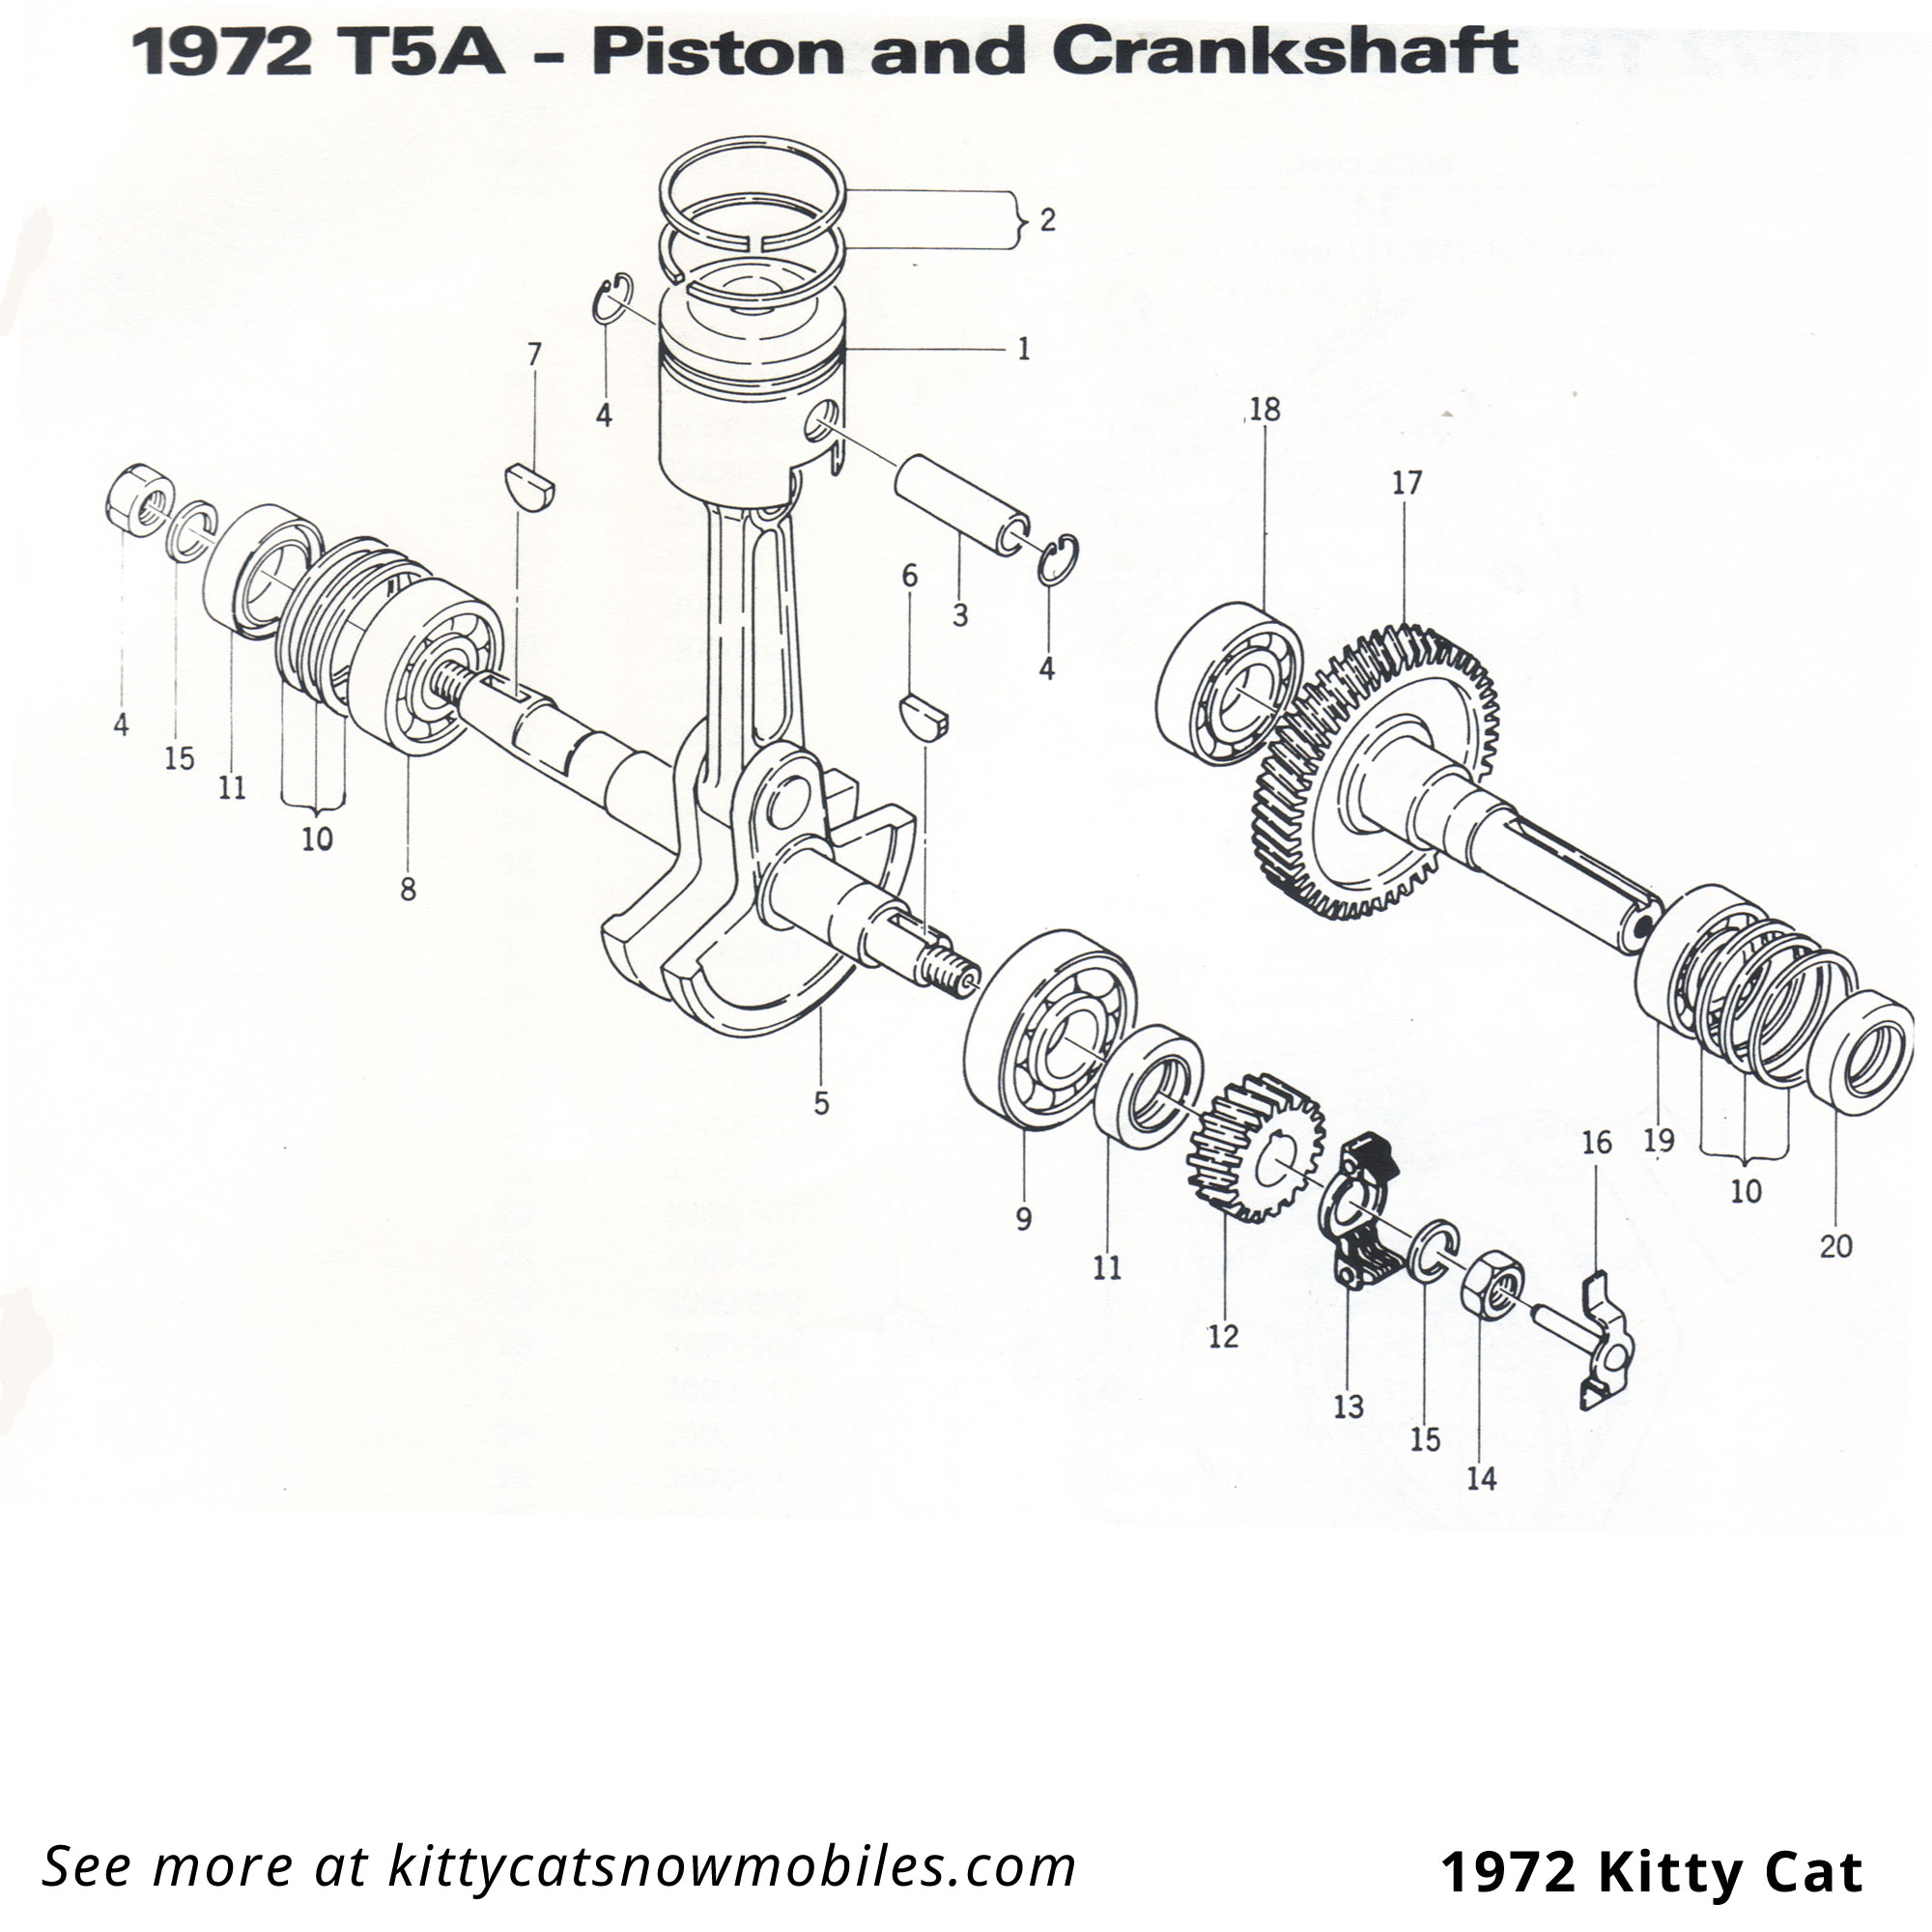 72 Kitty Cat Piston And Crankshaft Parts